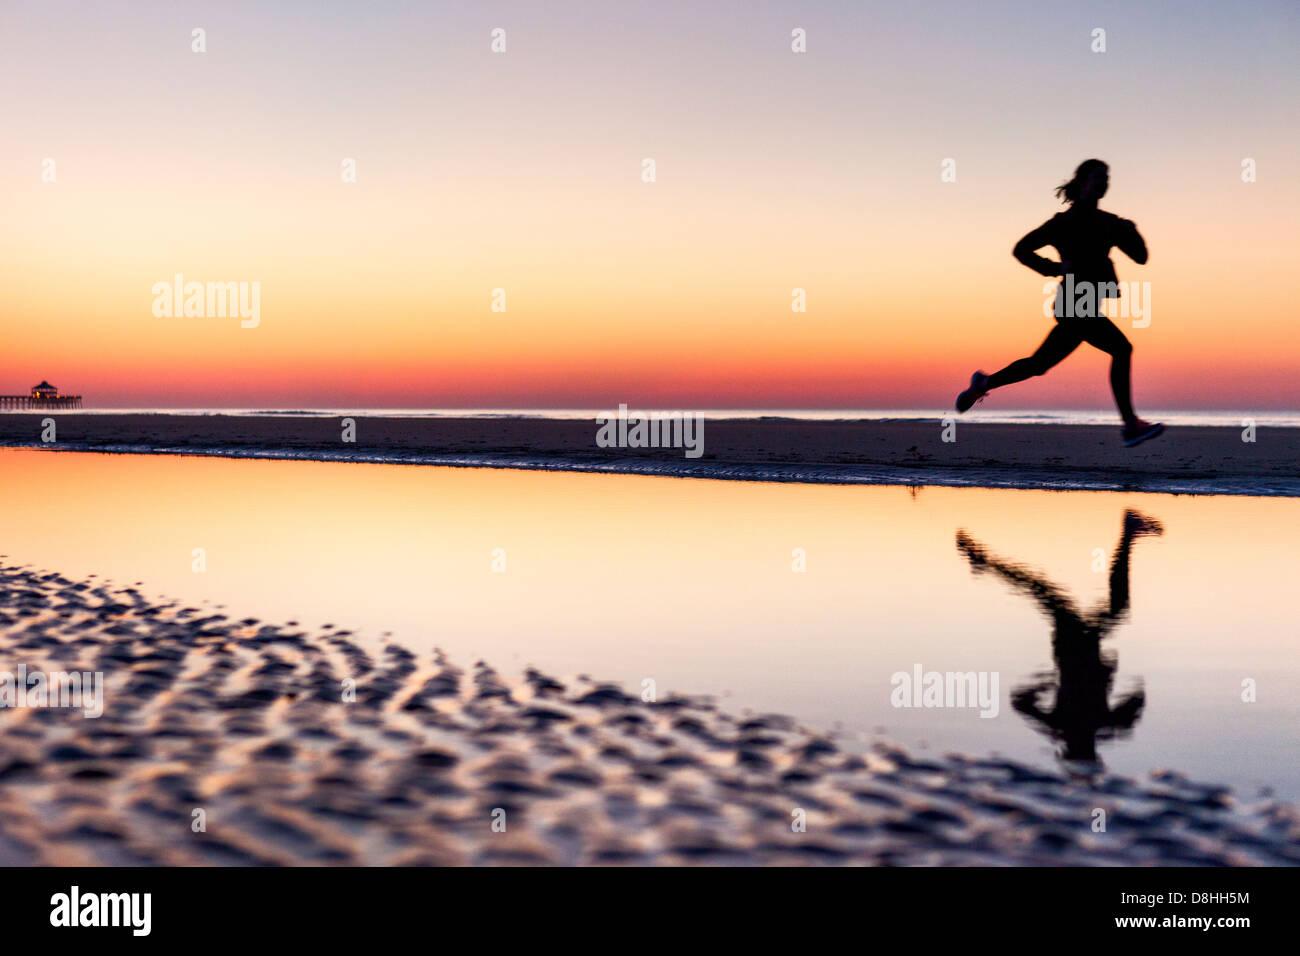 Female jogger at beach - Stock Image